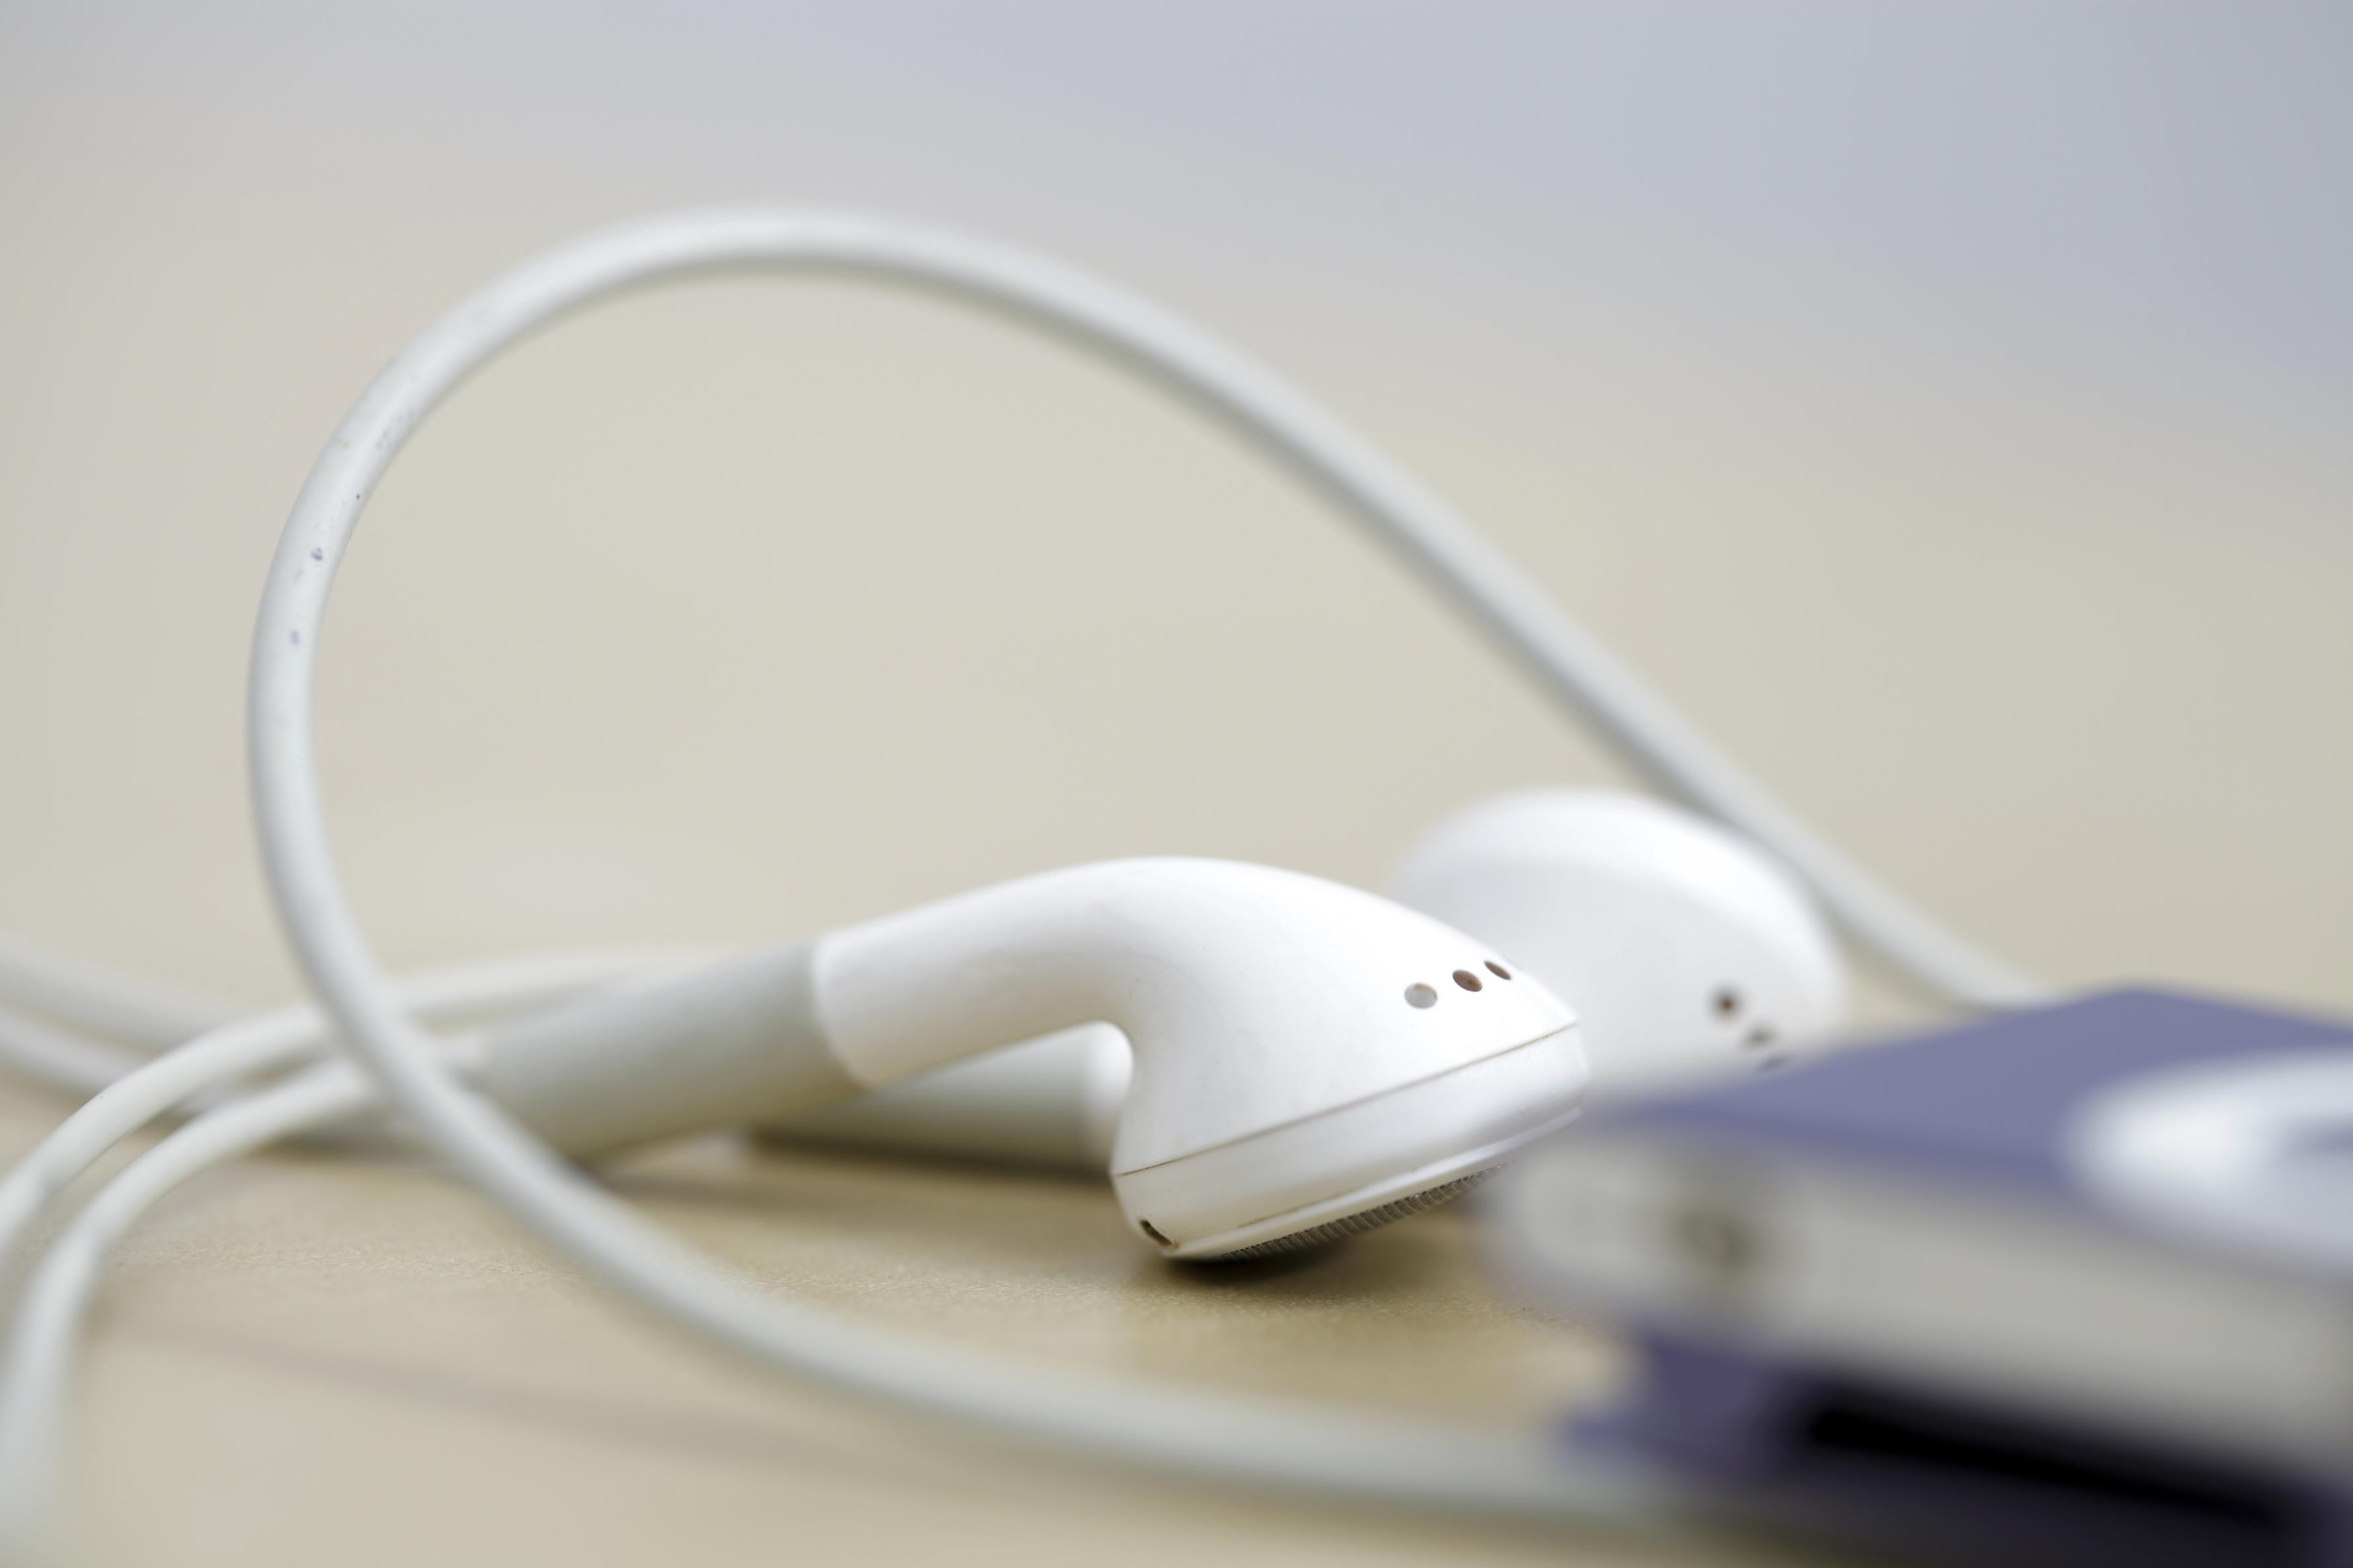 Ear buds, headphones